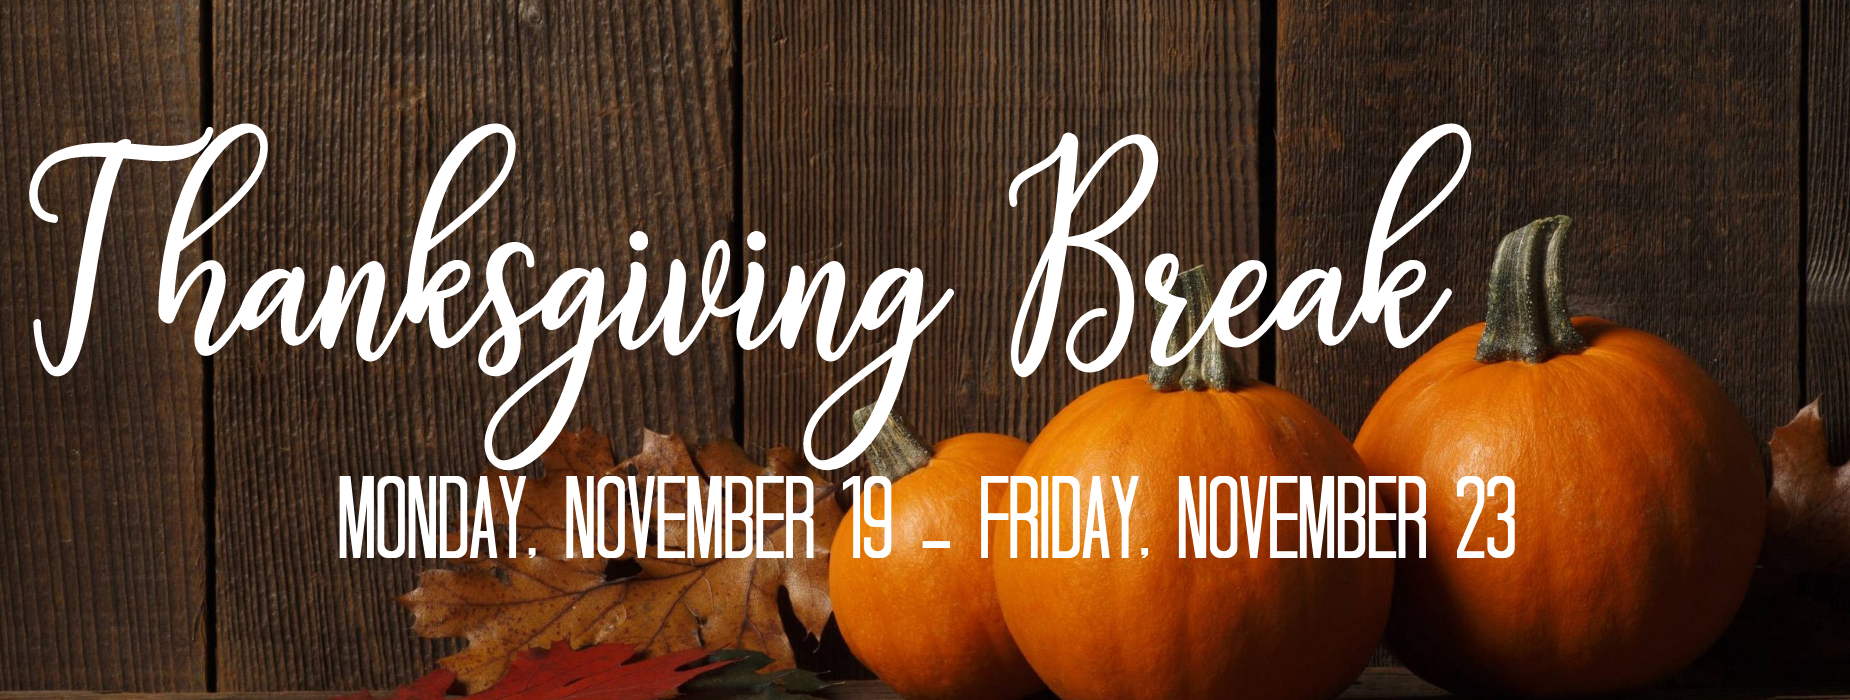 thanksgiving break nov. 19-23